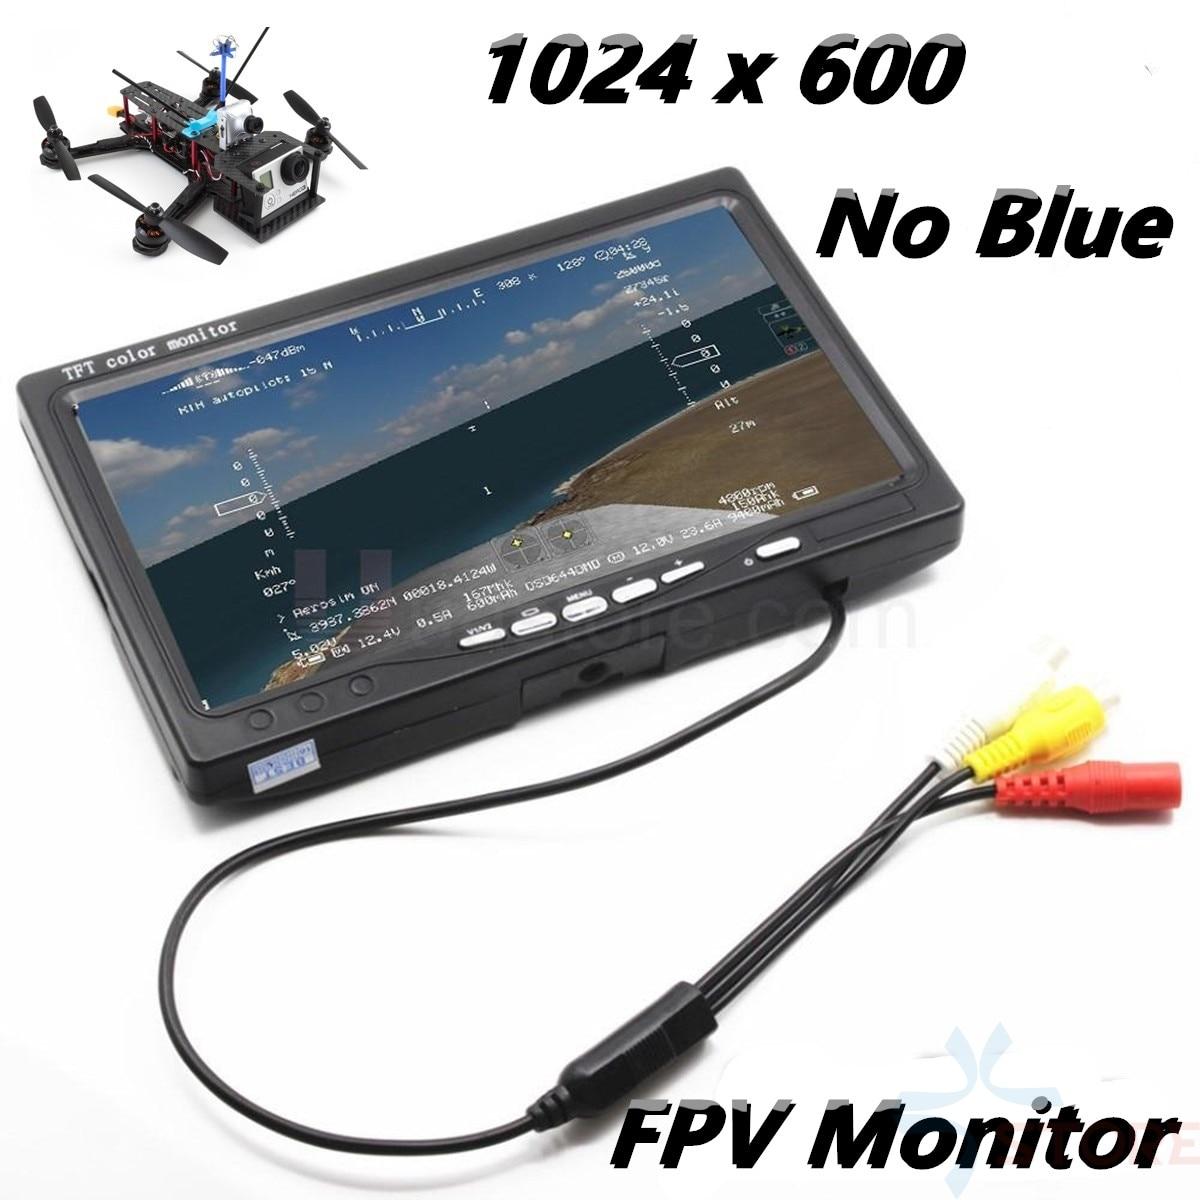 7 inch LCD TFT FPV Monitor 1024x600 w/T plug Screen No blue FPV Monitor Photography for Ground Station Phantom RC Model QAV250<br>